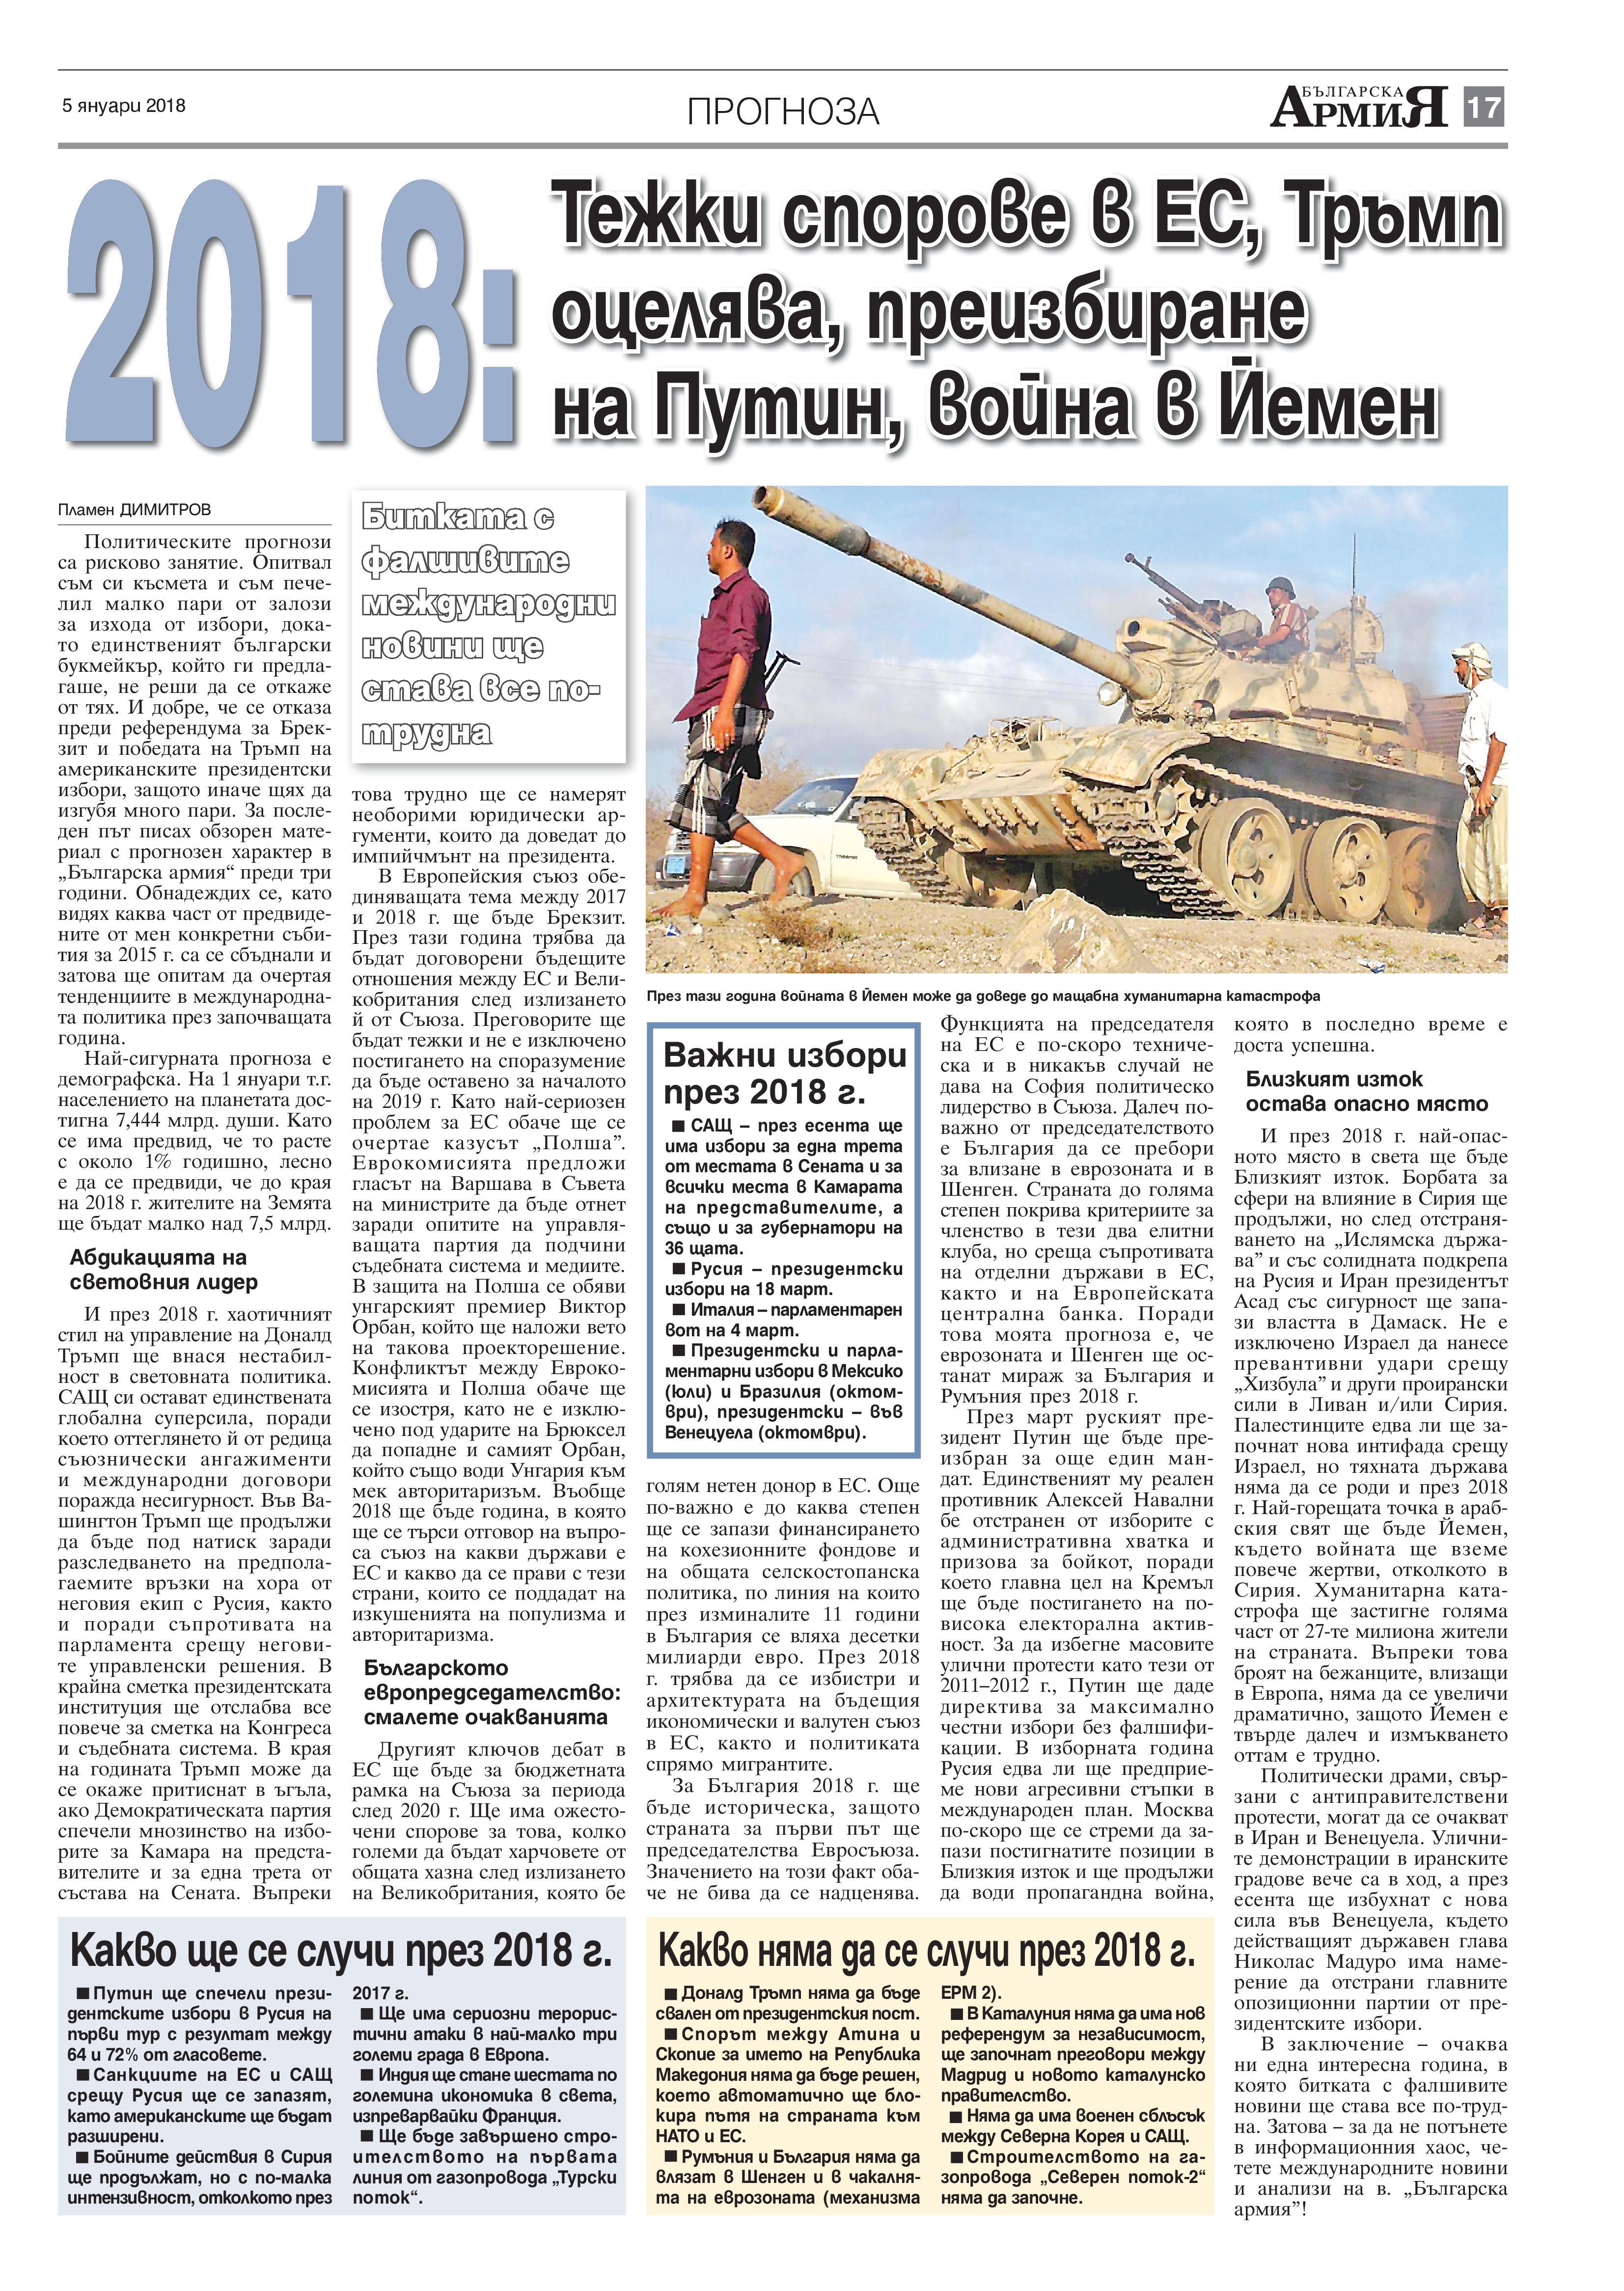 http://armymedia.bg/wp-content/uploads/2018/01/17.jpg